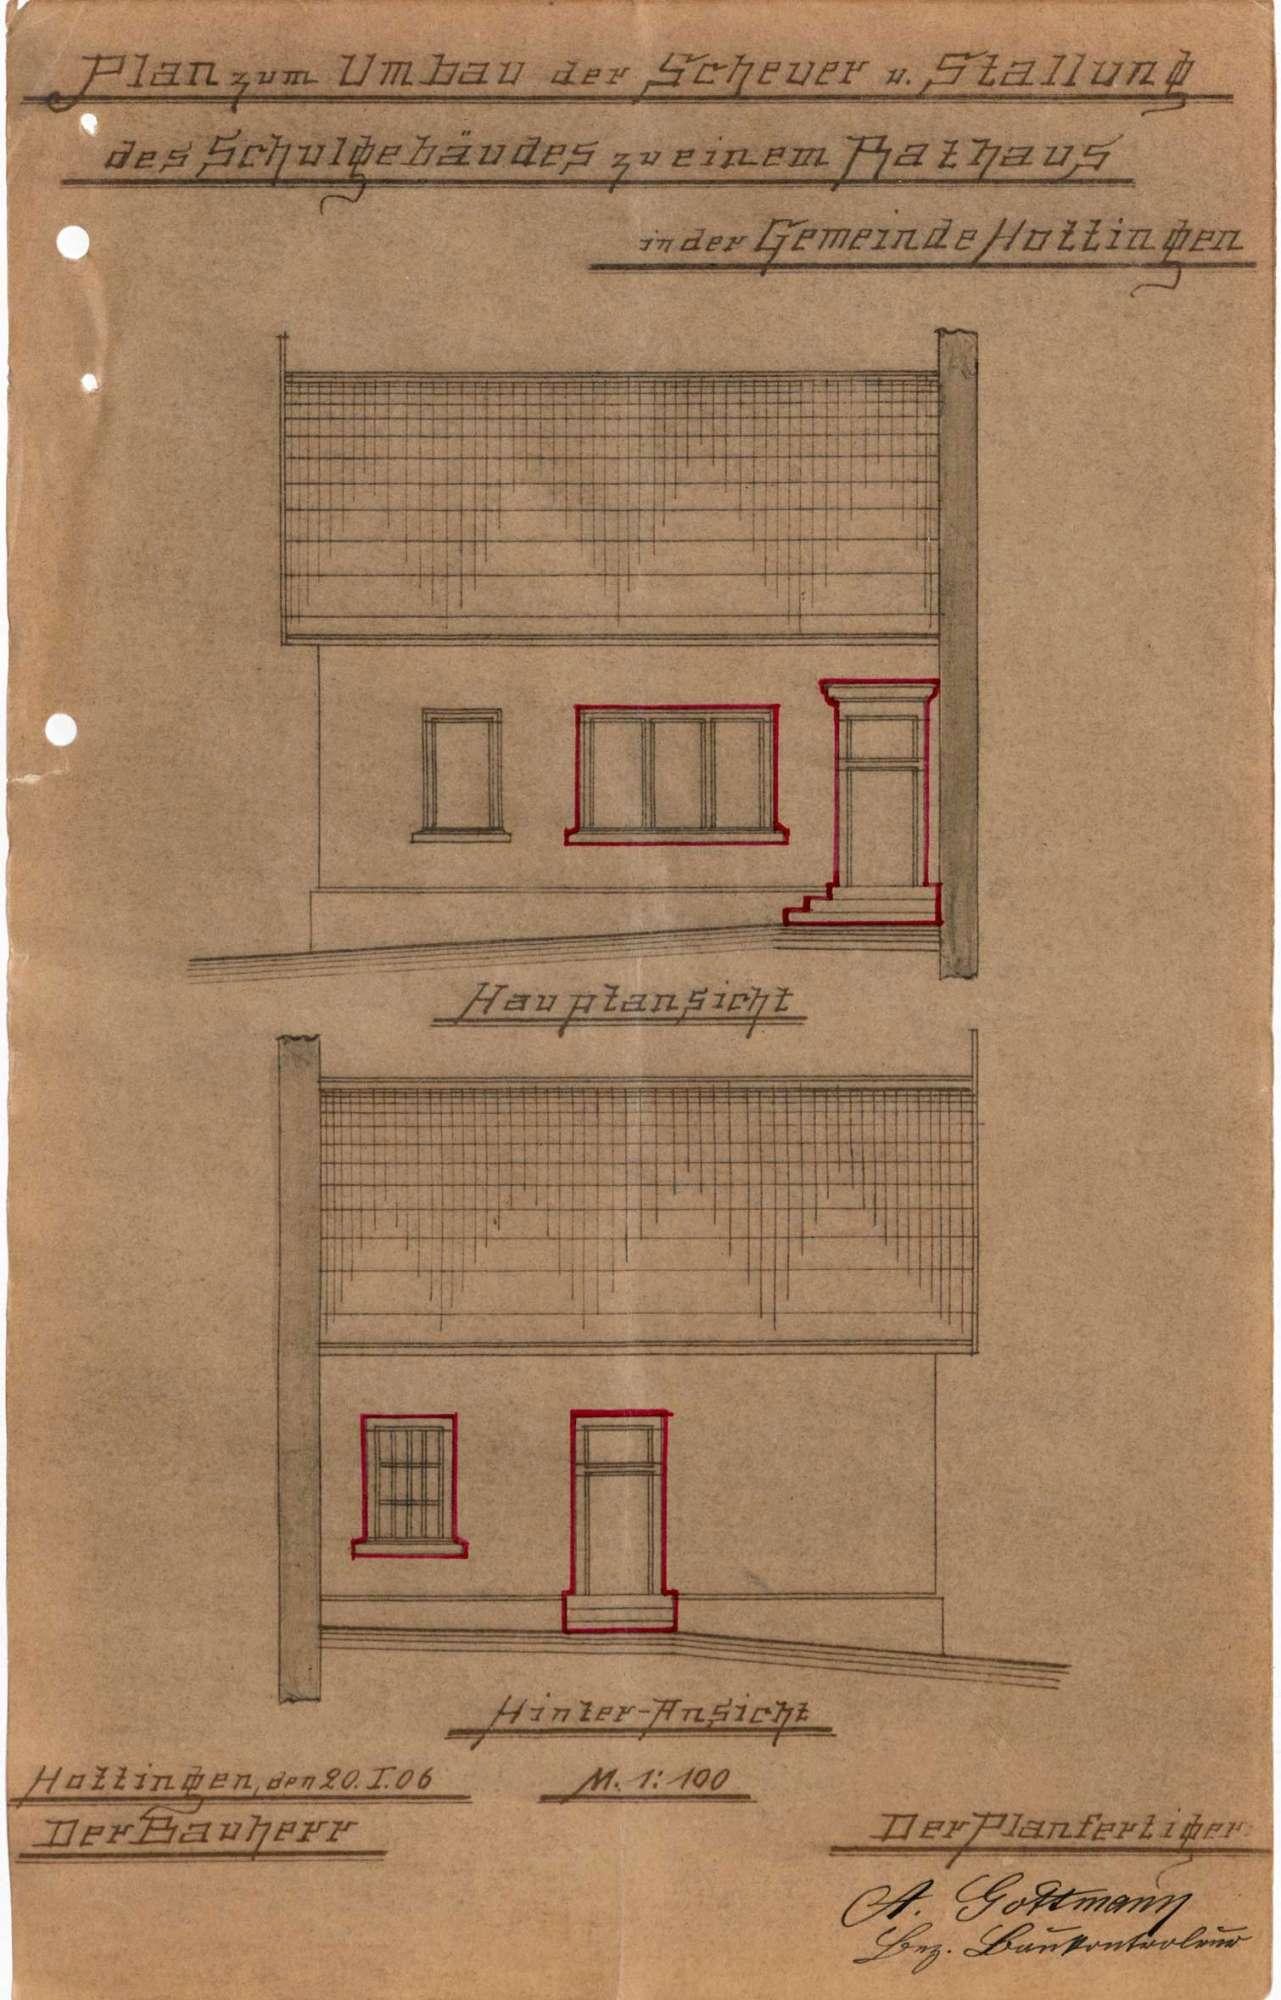 Umbau des Rathauses der Gemeinde Hottingen, Bild 3